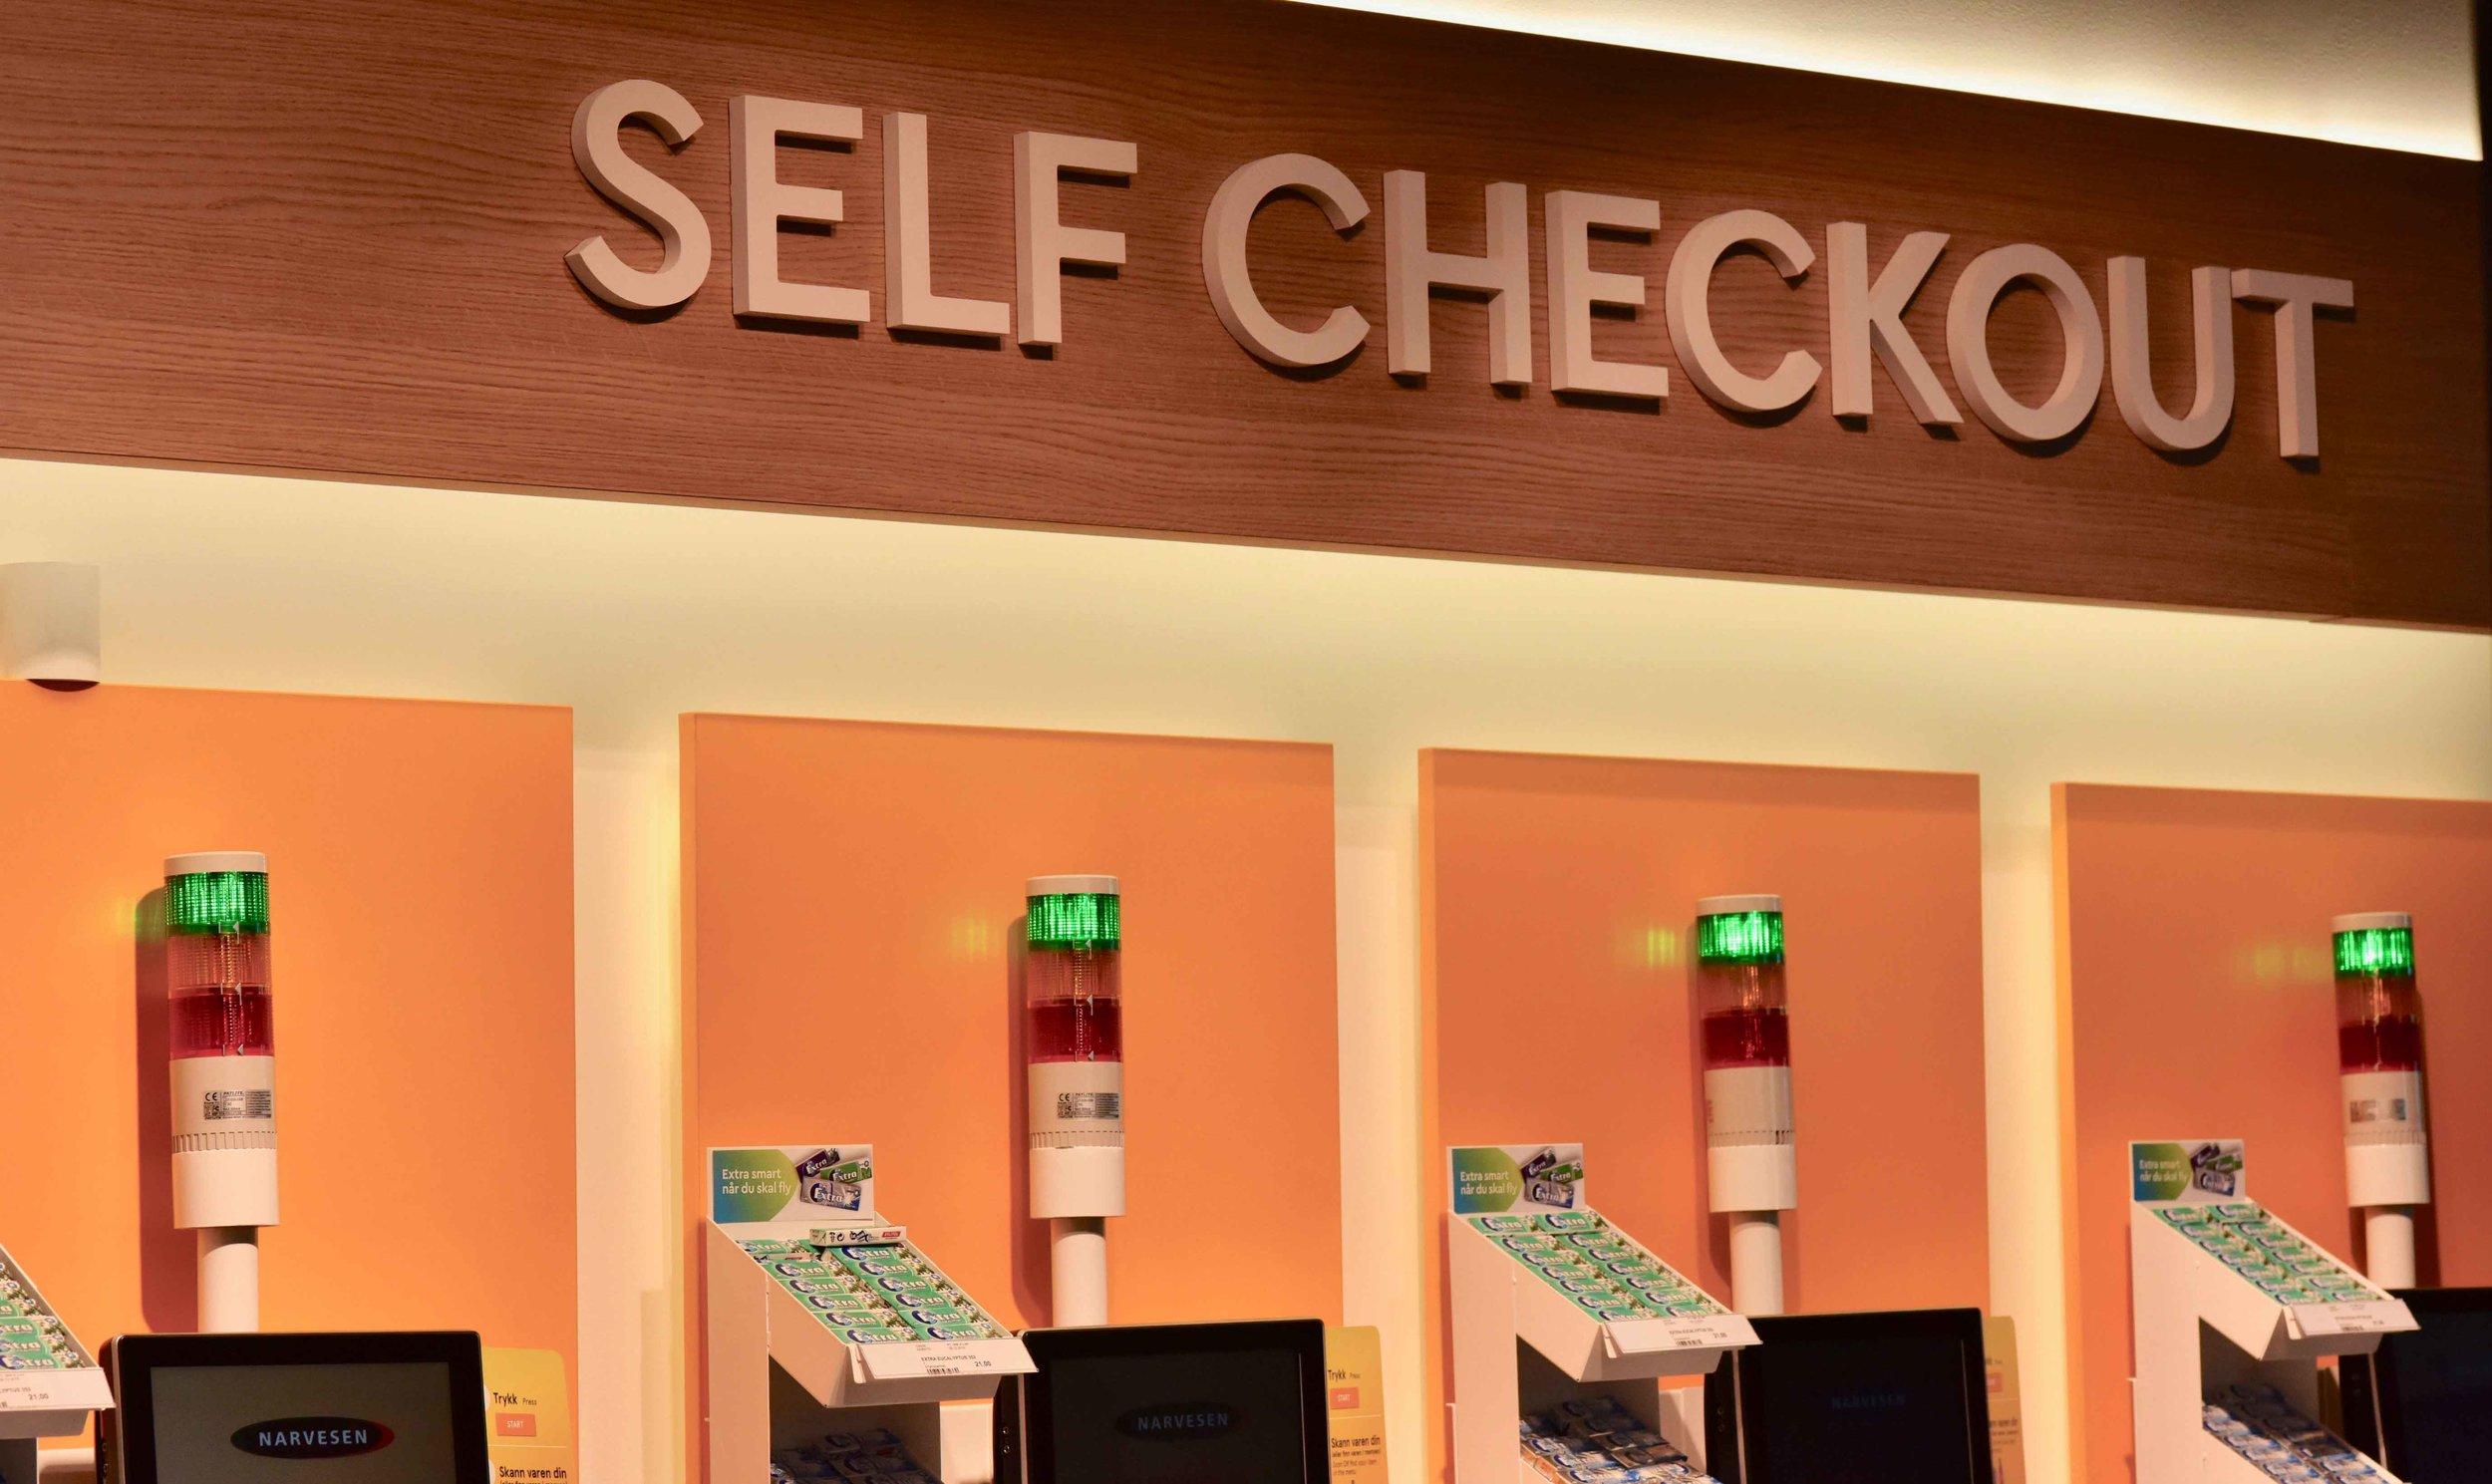 Self Checkout shops,Oslo Gardermoen Airport, Oslo, Norway. Image©thingstodot.com